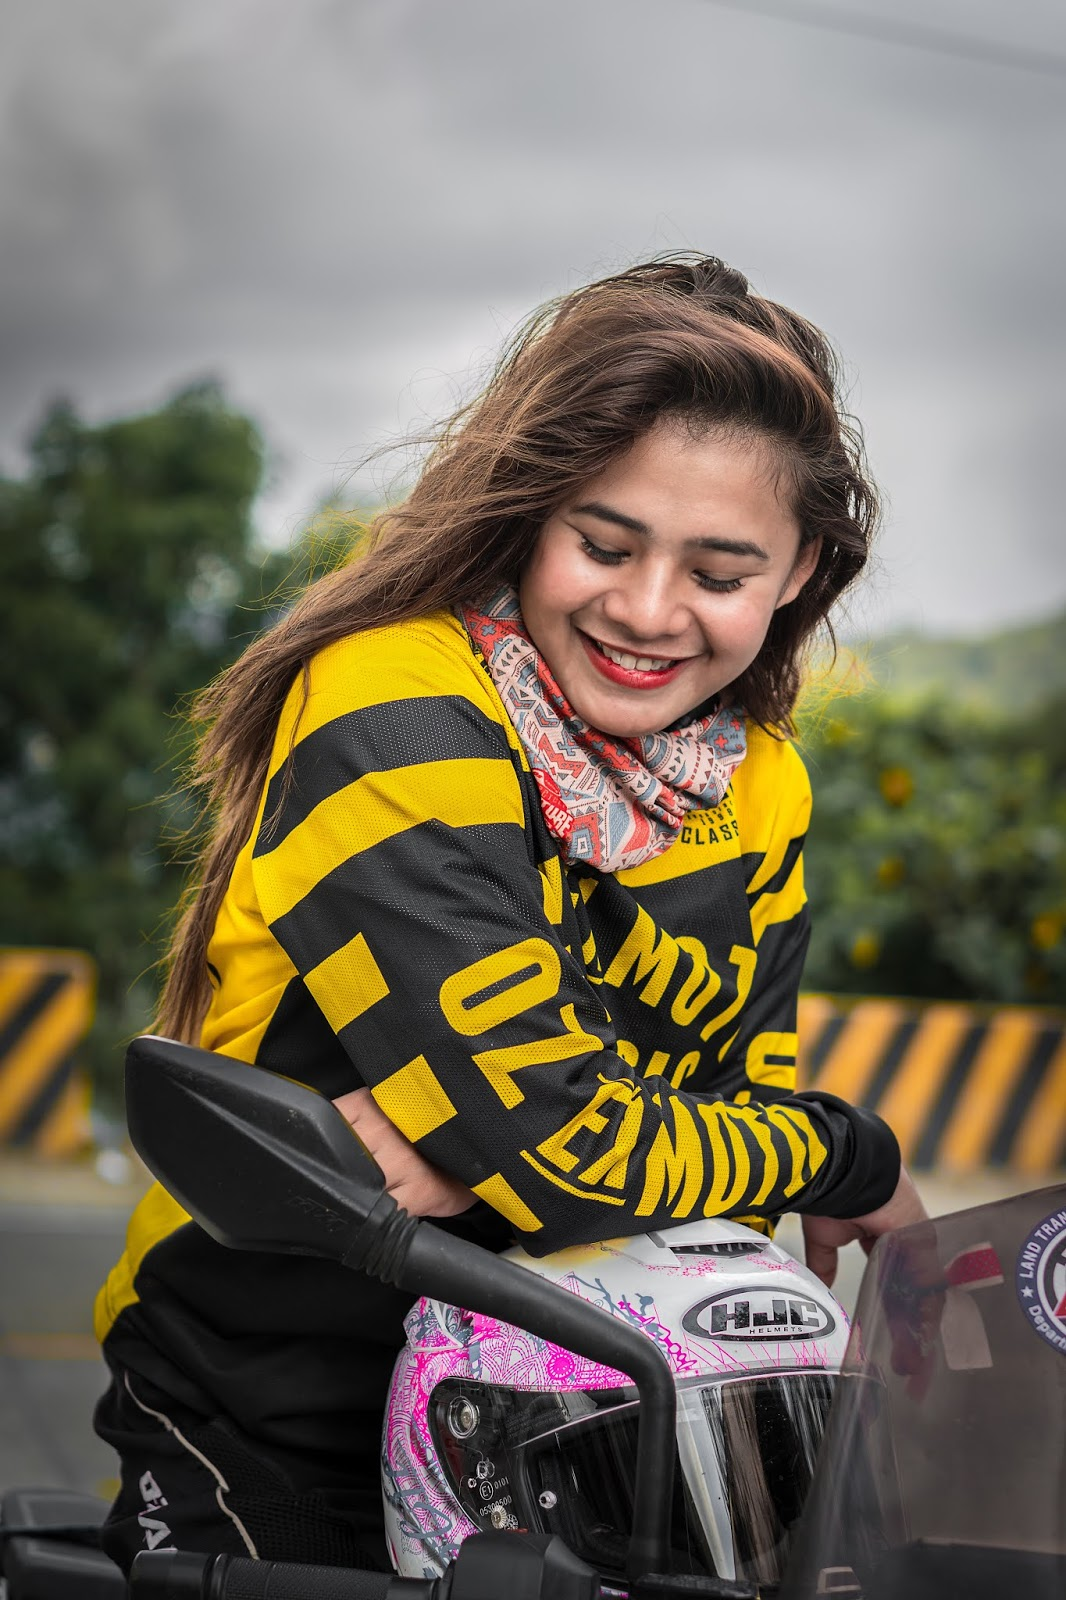 Top 3 Mods for Suzuki Boulevard S40 For Female Bike Lovers